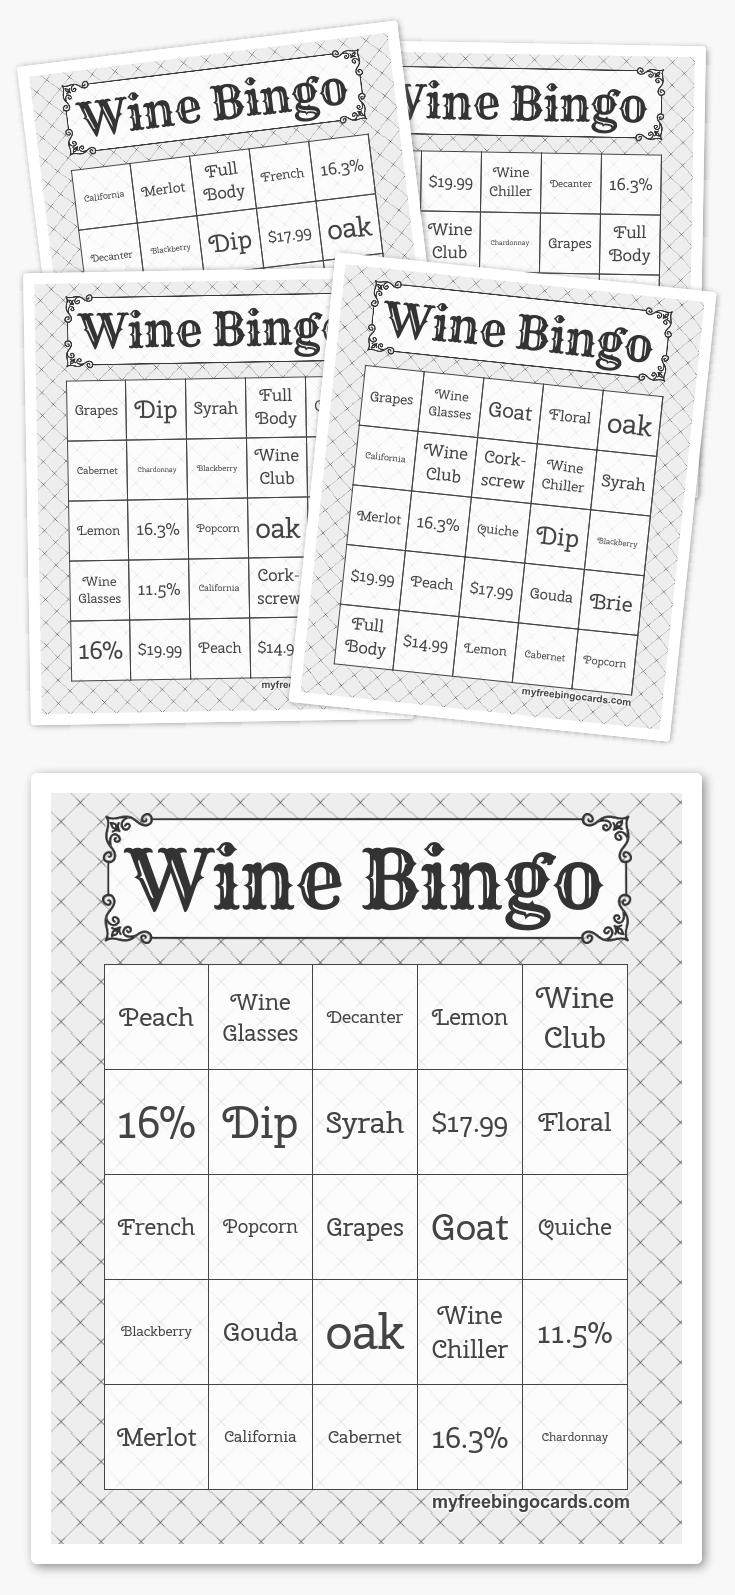 Free Printable Bingo Cards In 2019 | Partaaaay Planning | Free Bingo - Free Printable Bingo Cards